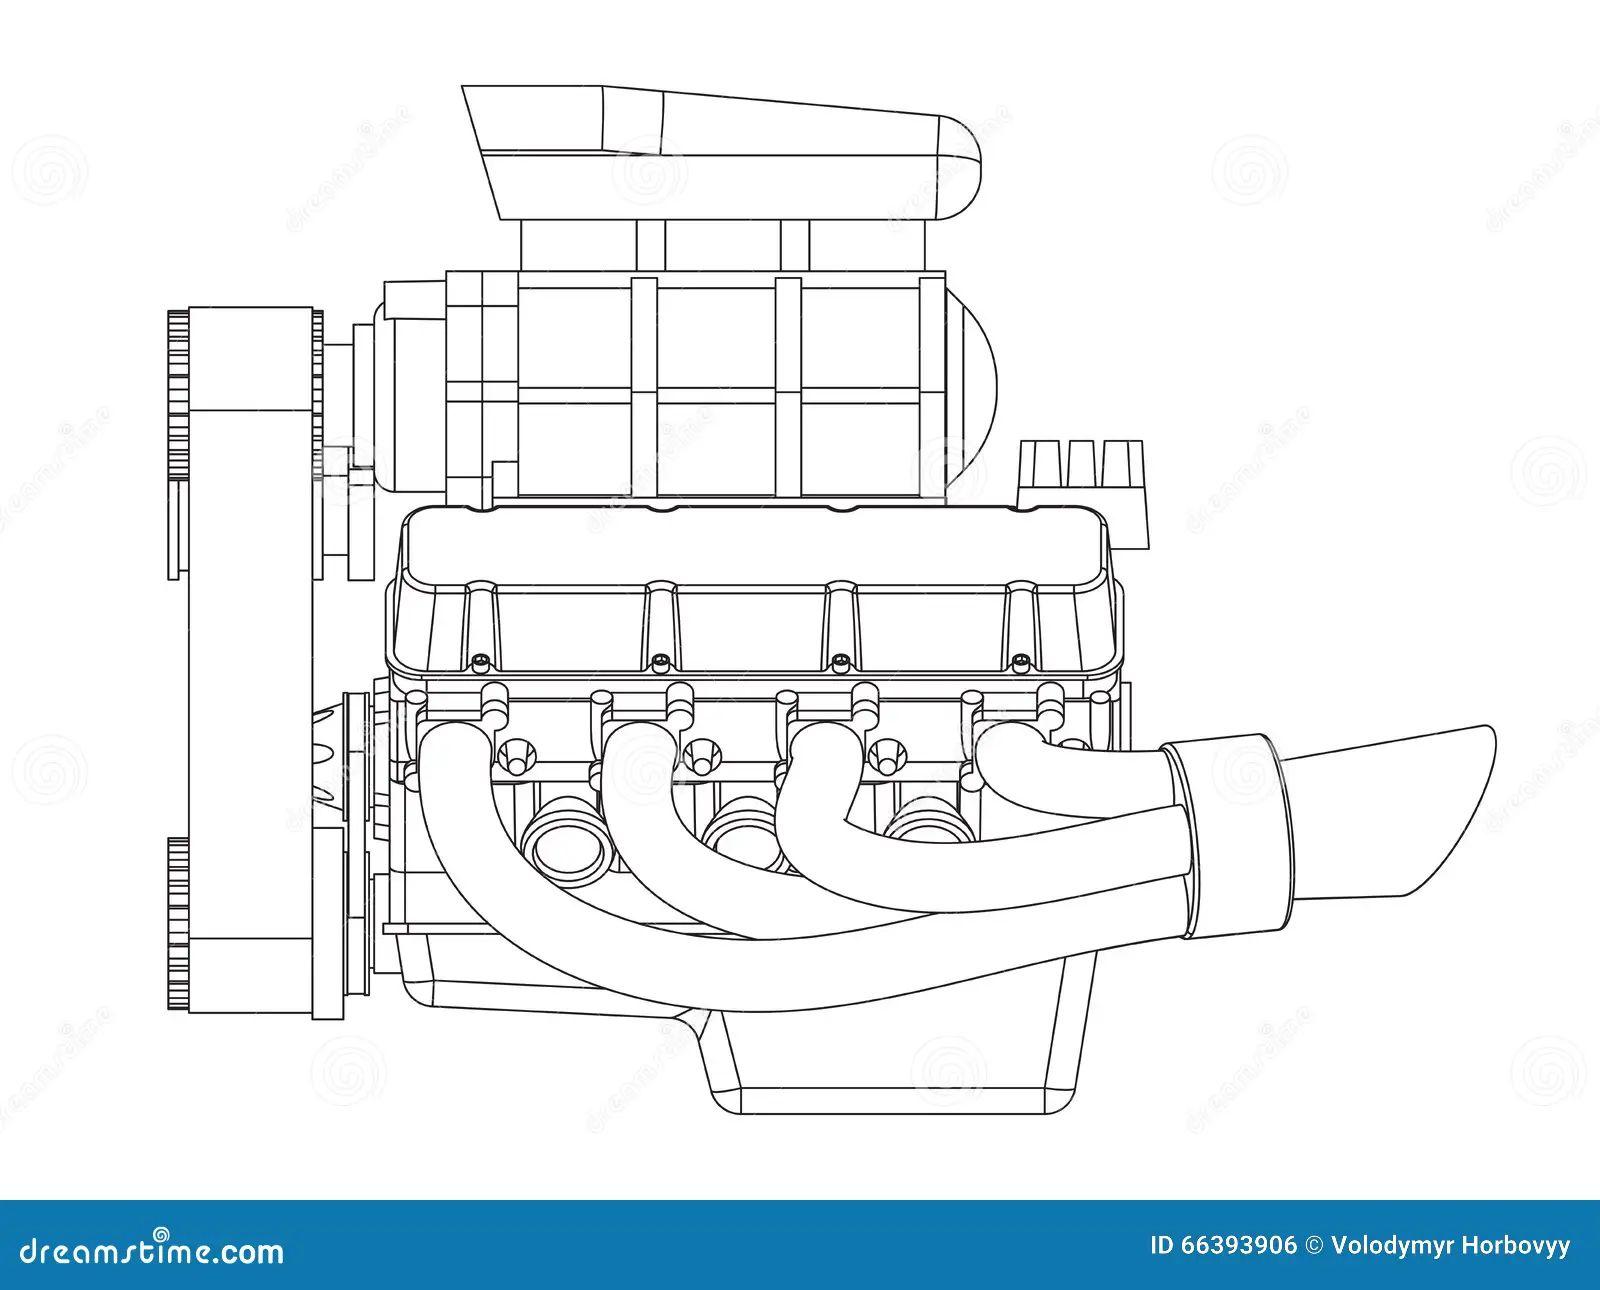 valve audio compressor schematic